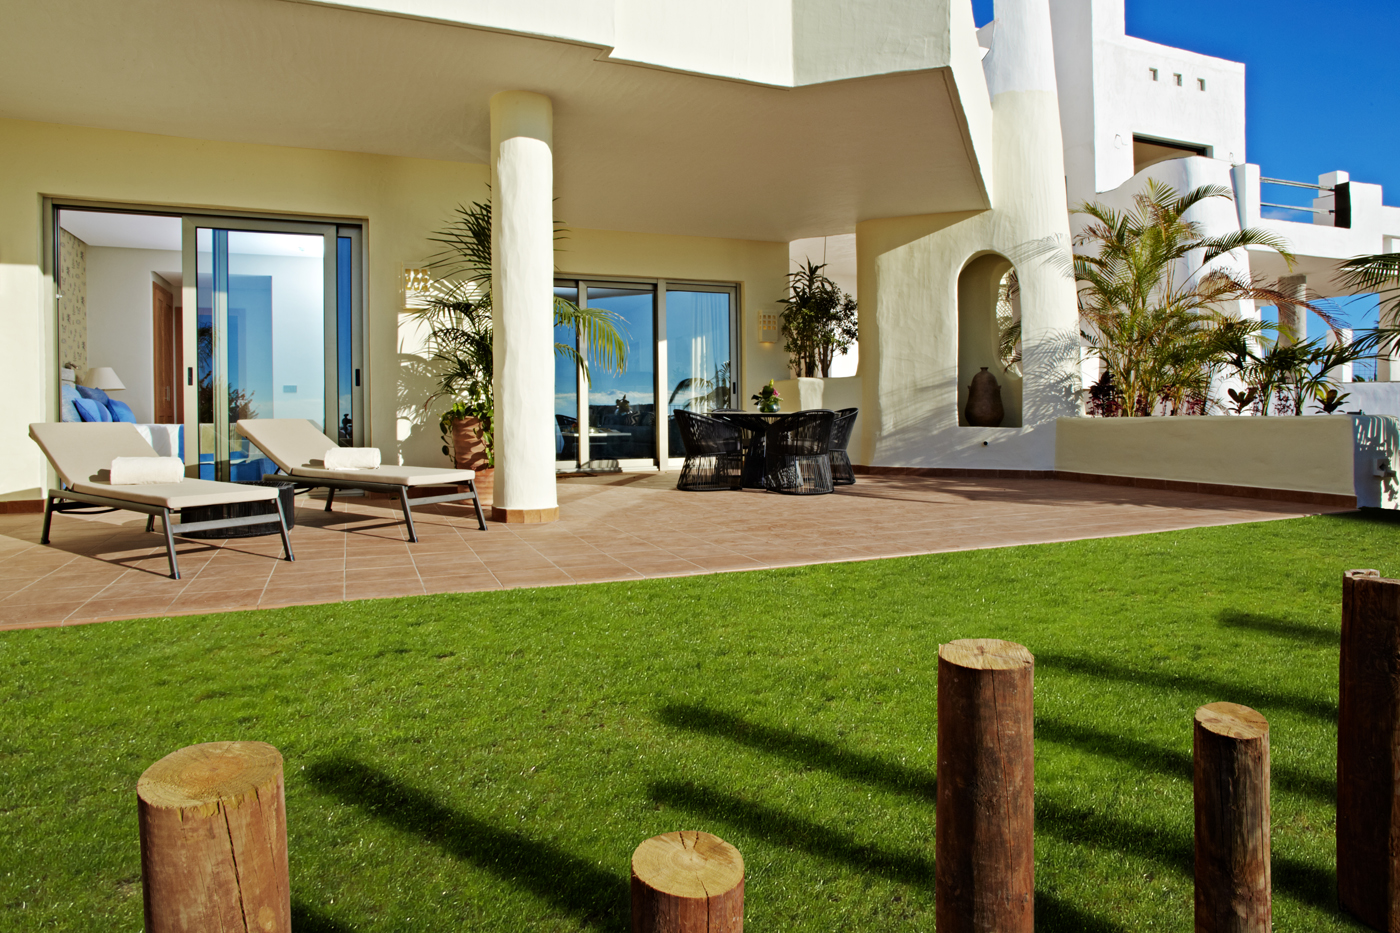 Căn hộ vì Bán tại Abama Terraces Abama Golf, Tenerife Canary Islands 38687 Tây Ban Nha